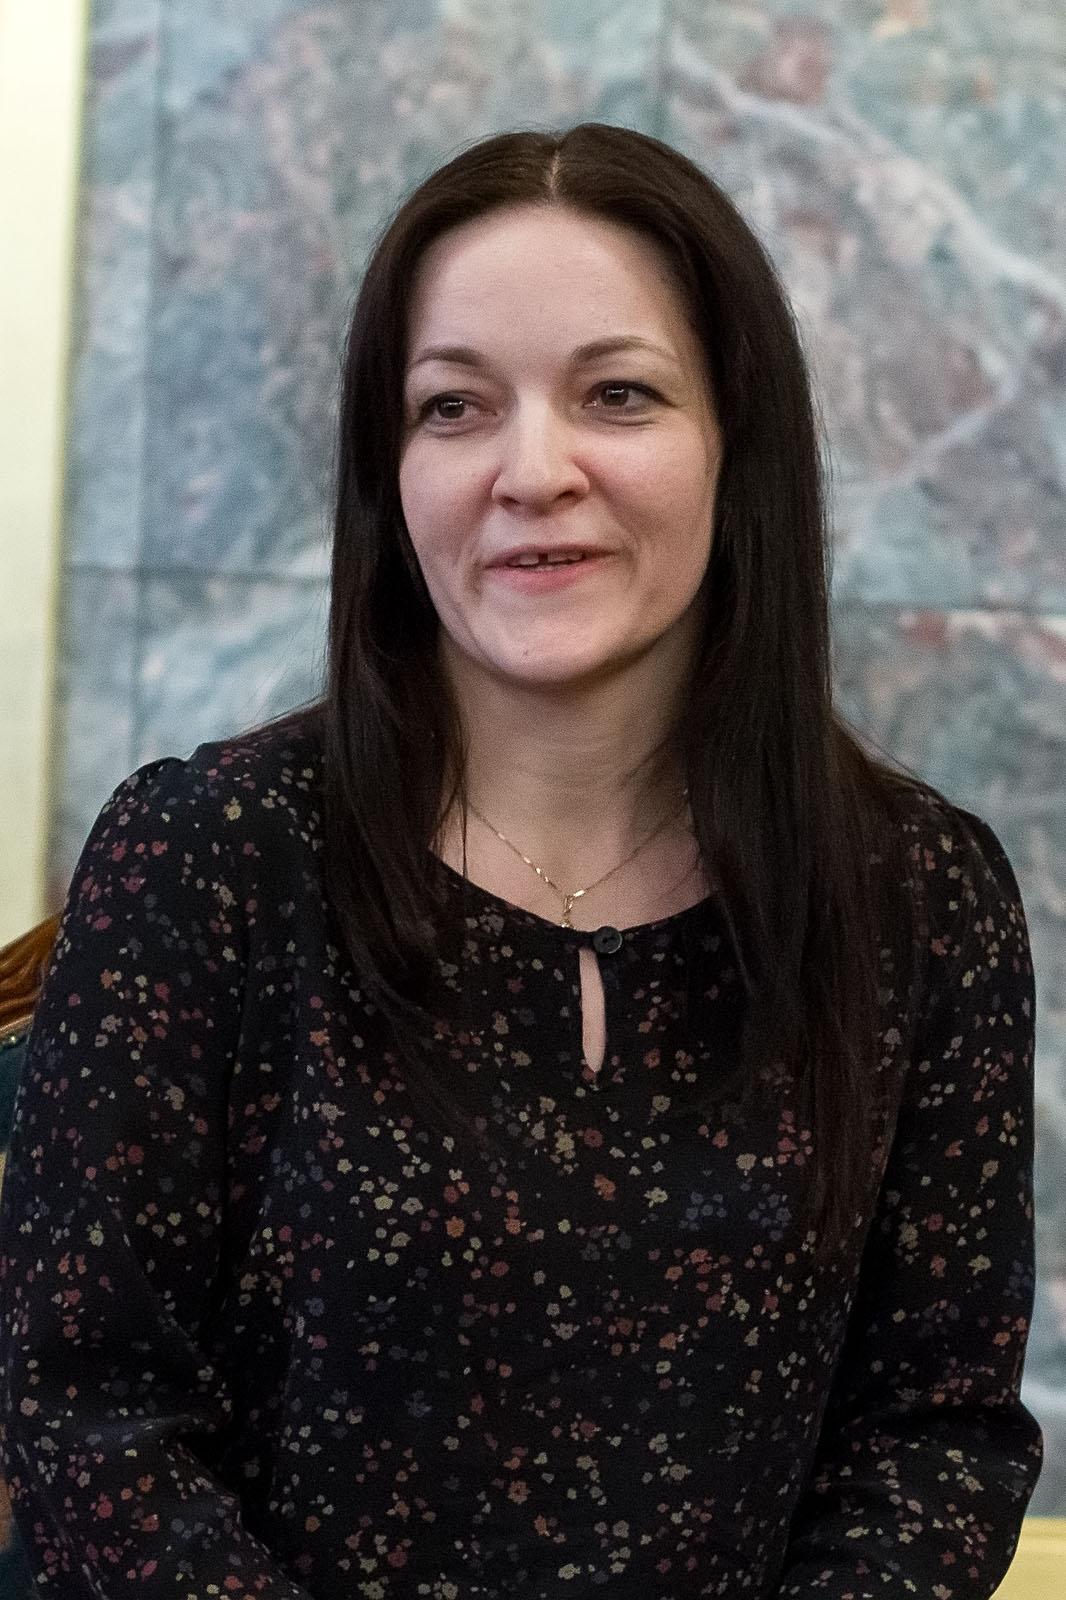 Фото №151134. Наталья Лукина, пресс-секретарь ГСО РТ